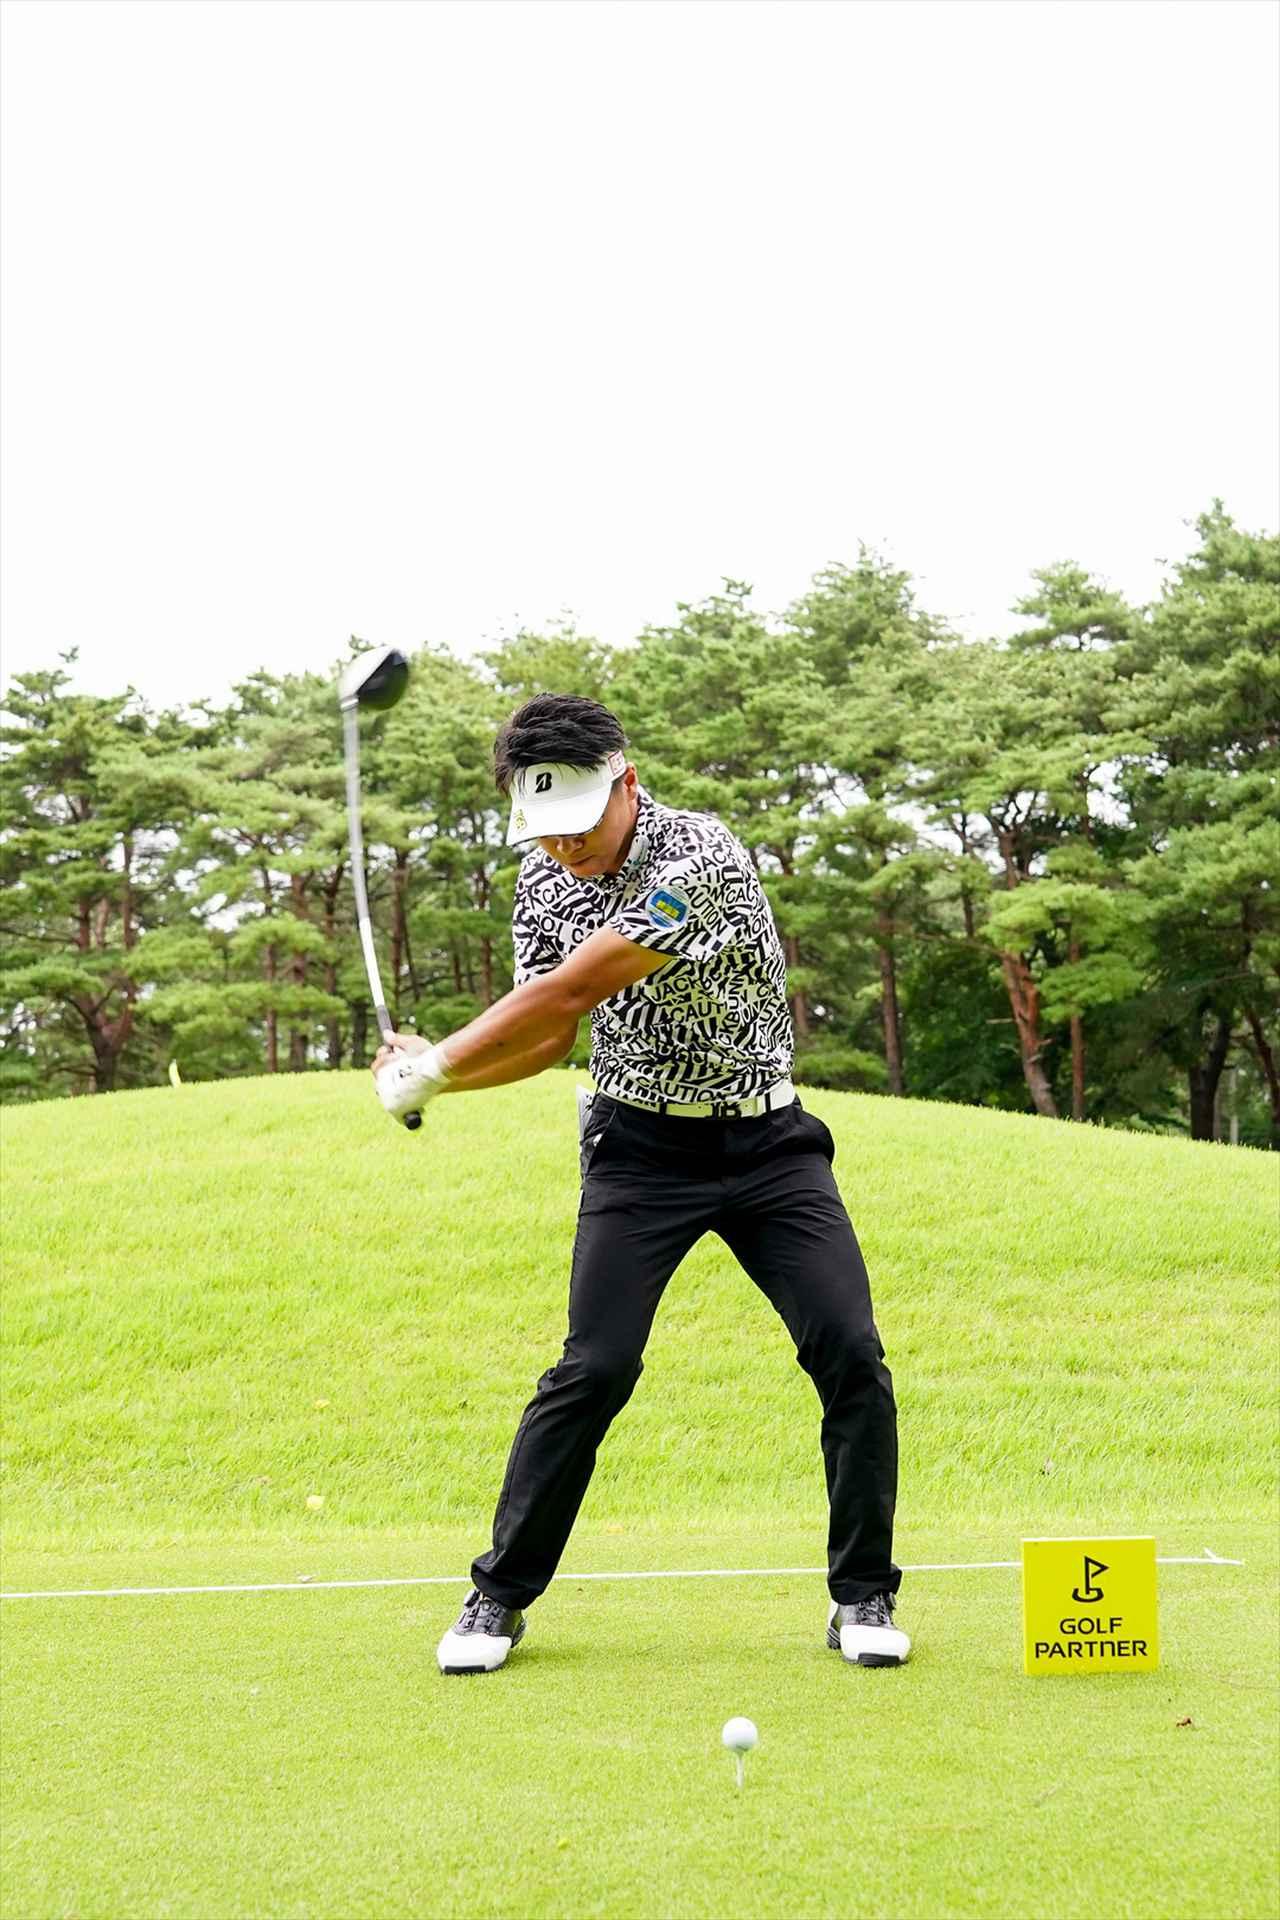 Images : 6番目の画像 - 関藤直煕 ドライバー正面連続写真 - みんなのゴルフダイジェスト